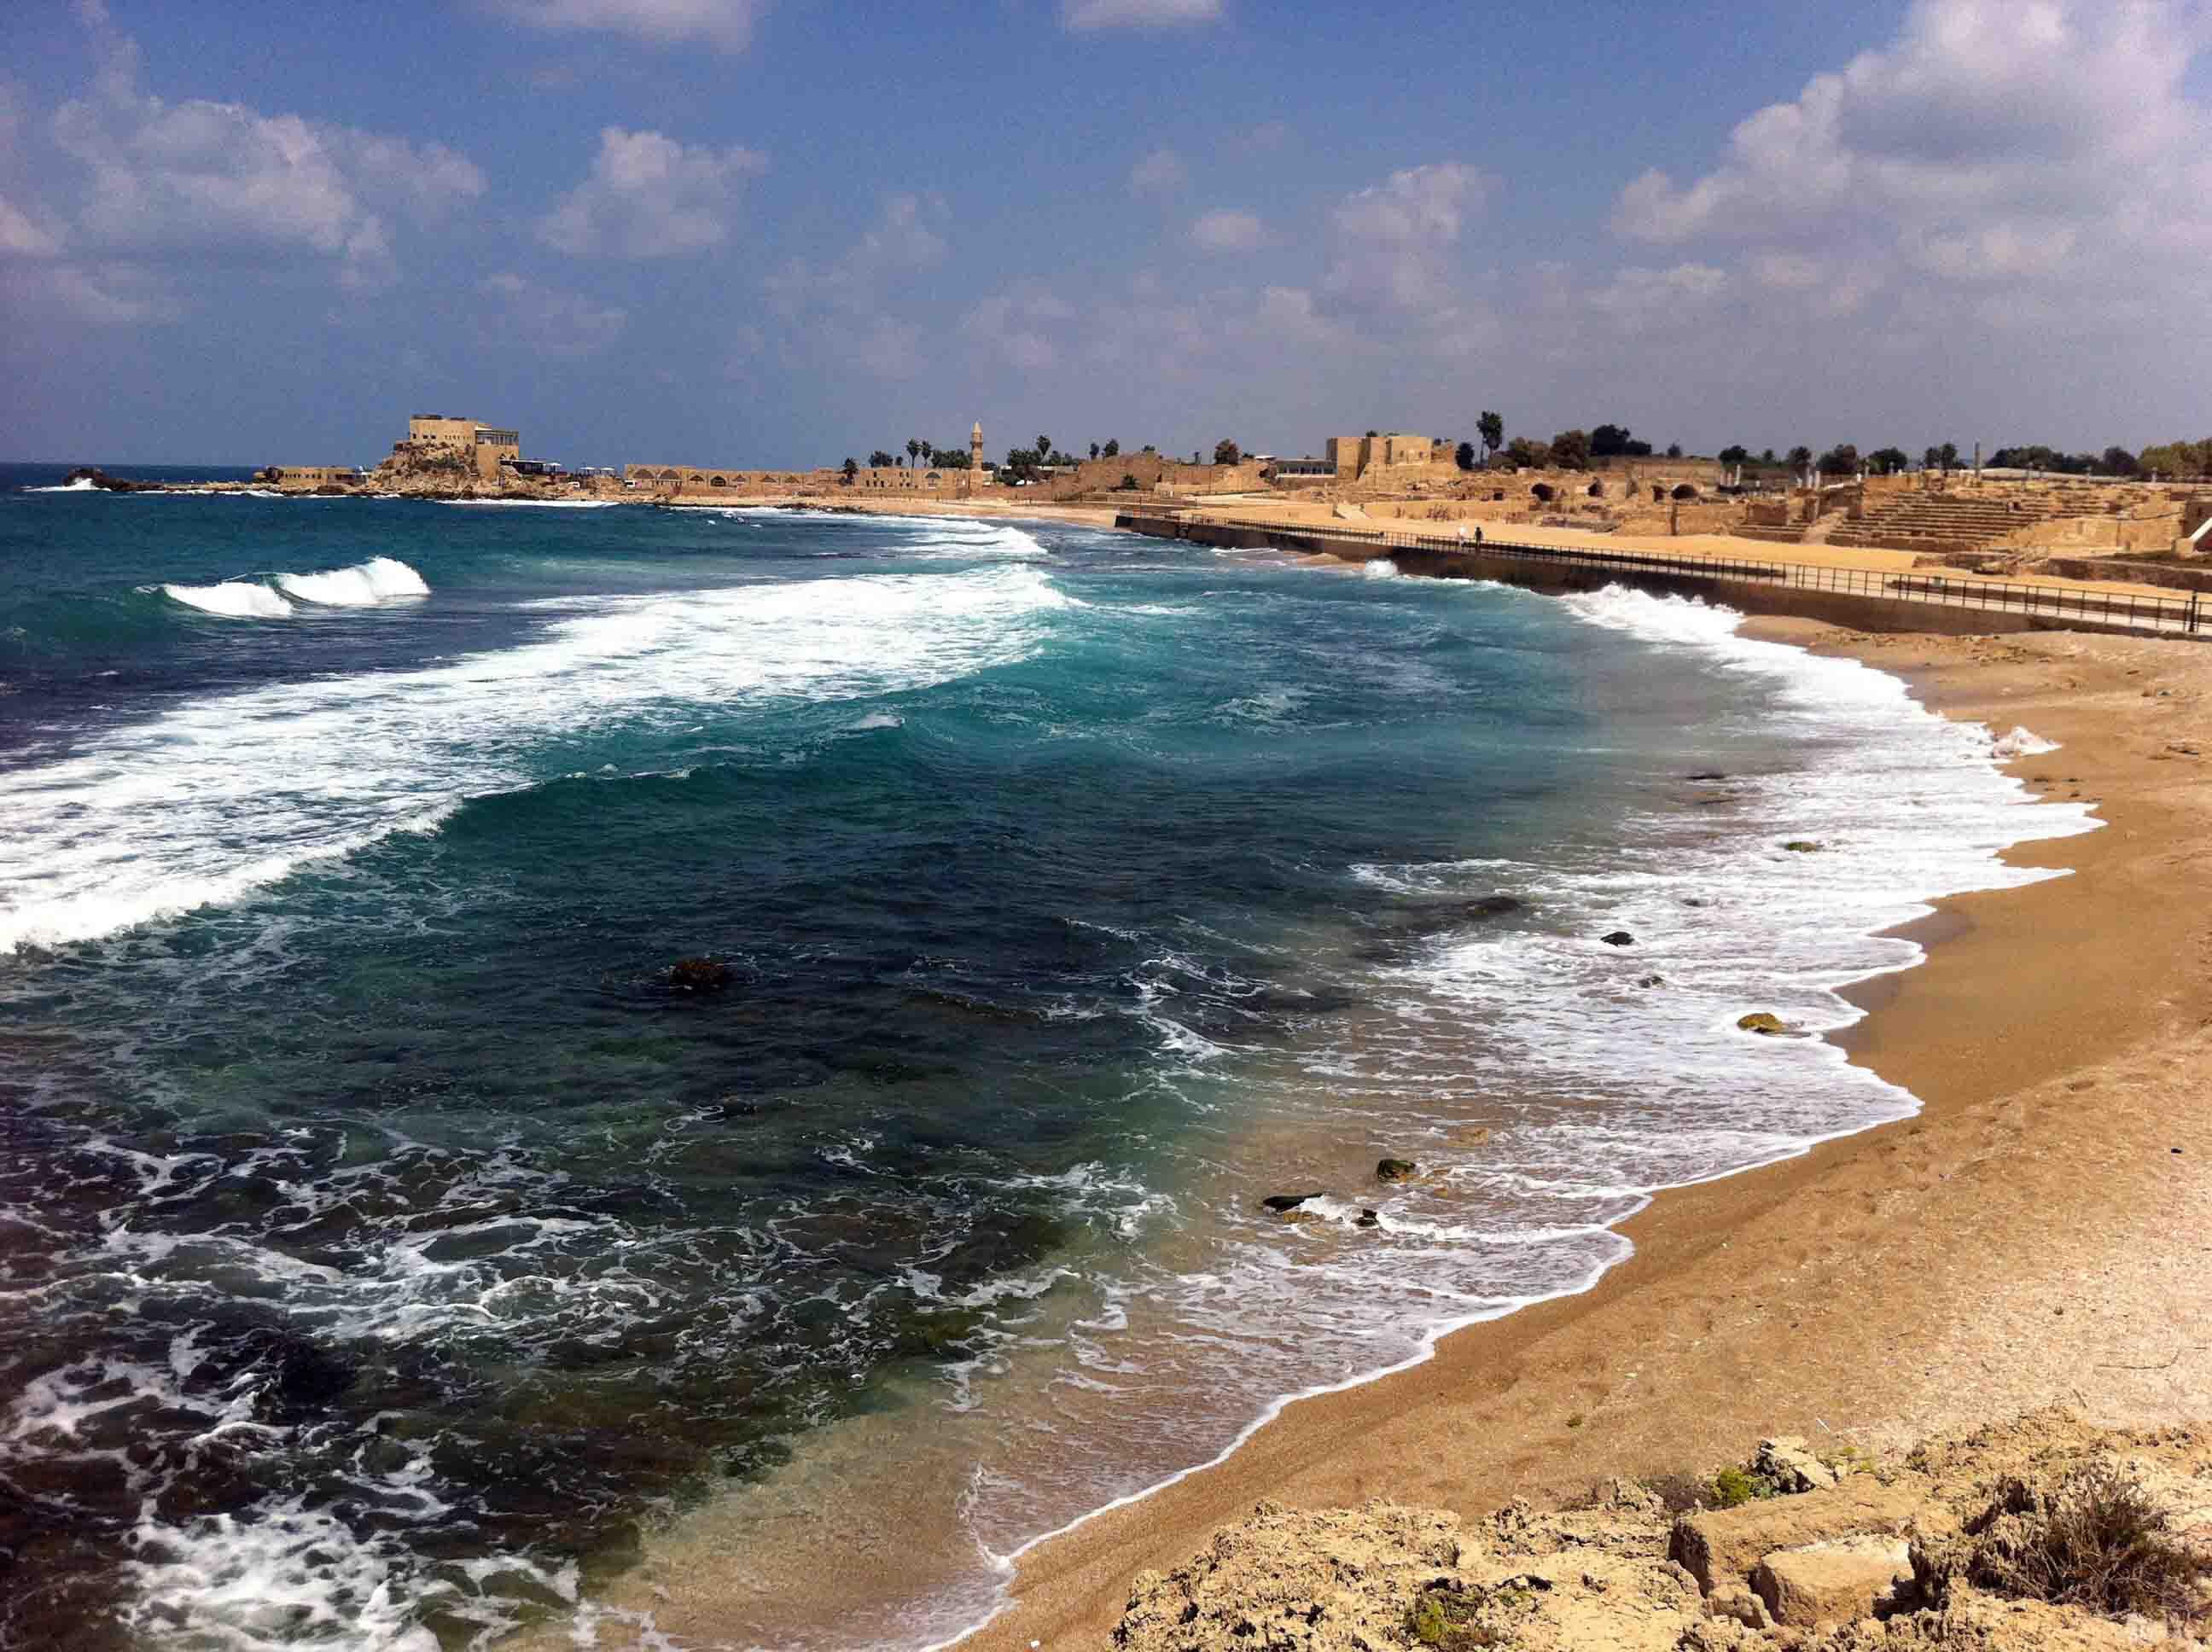 Visiting Jaffa, Caesarea & Beit She'arim National Park in Israel